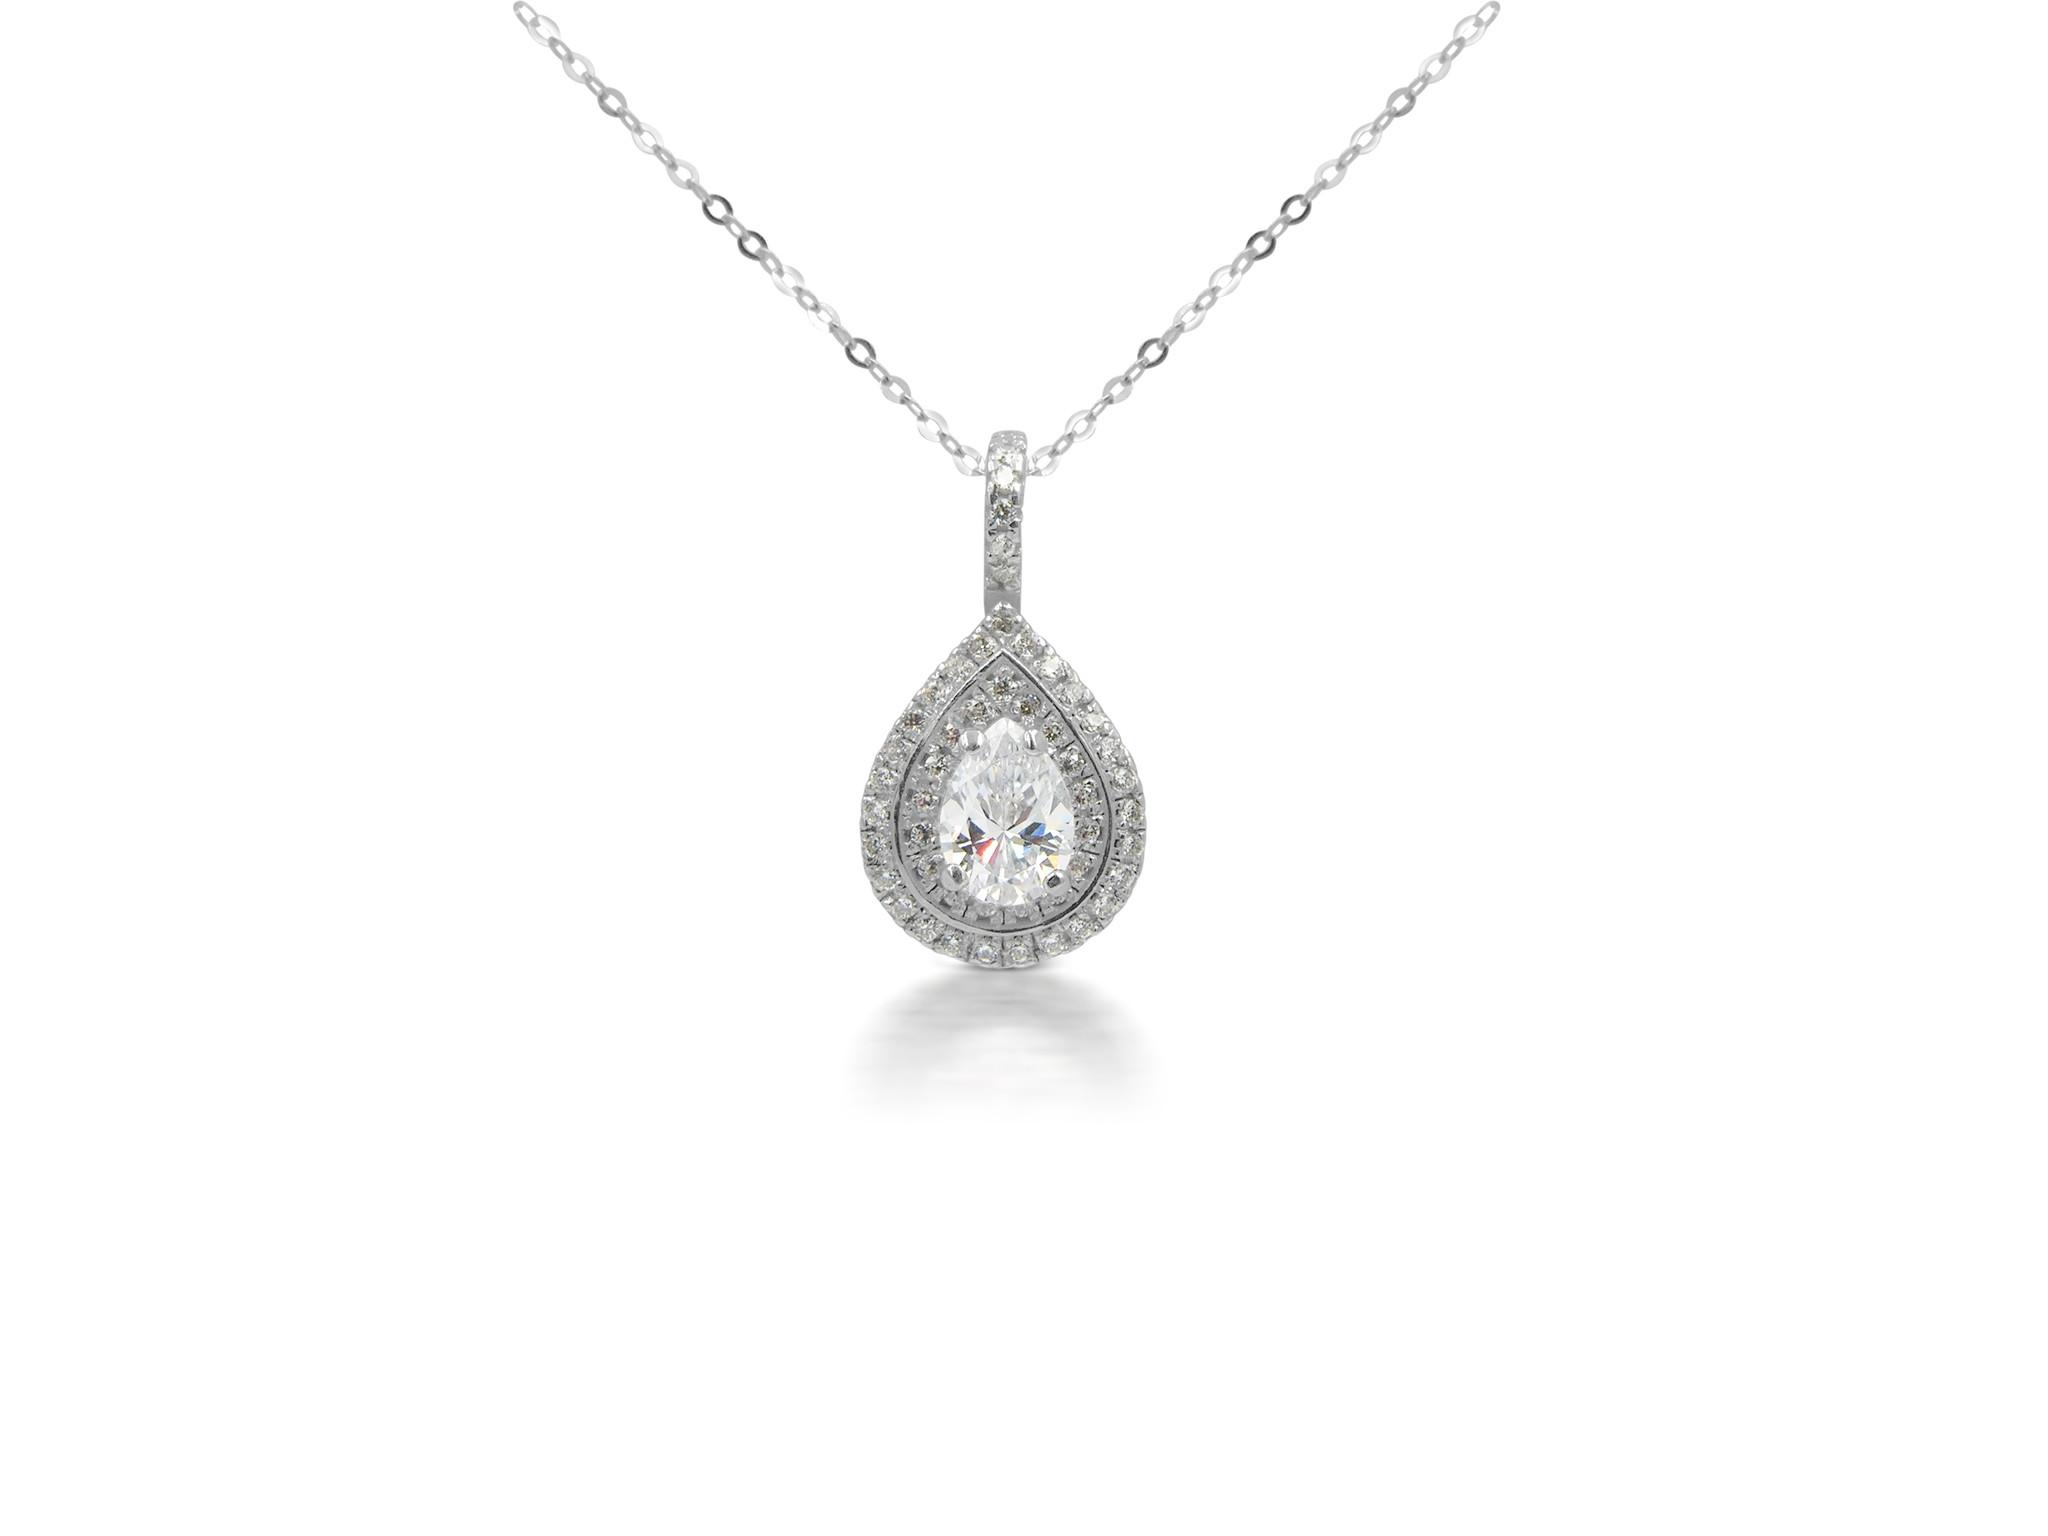 18 kt white gold pendant with zirconia